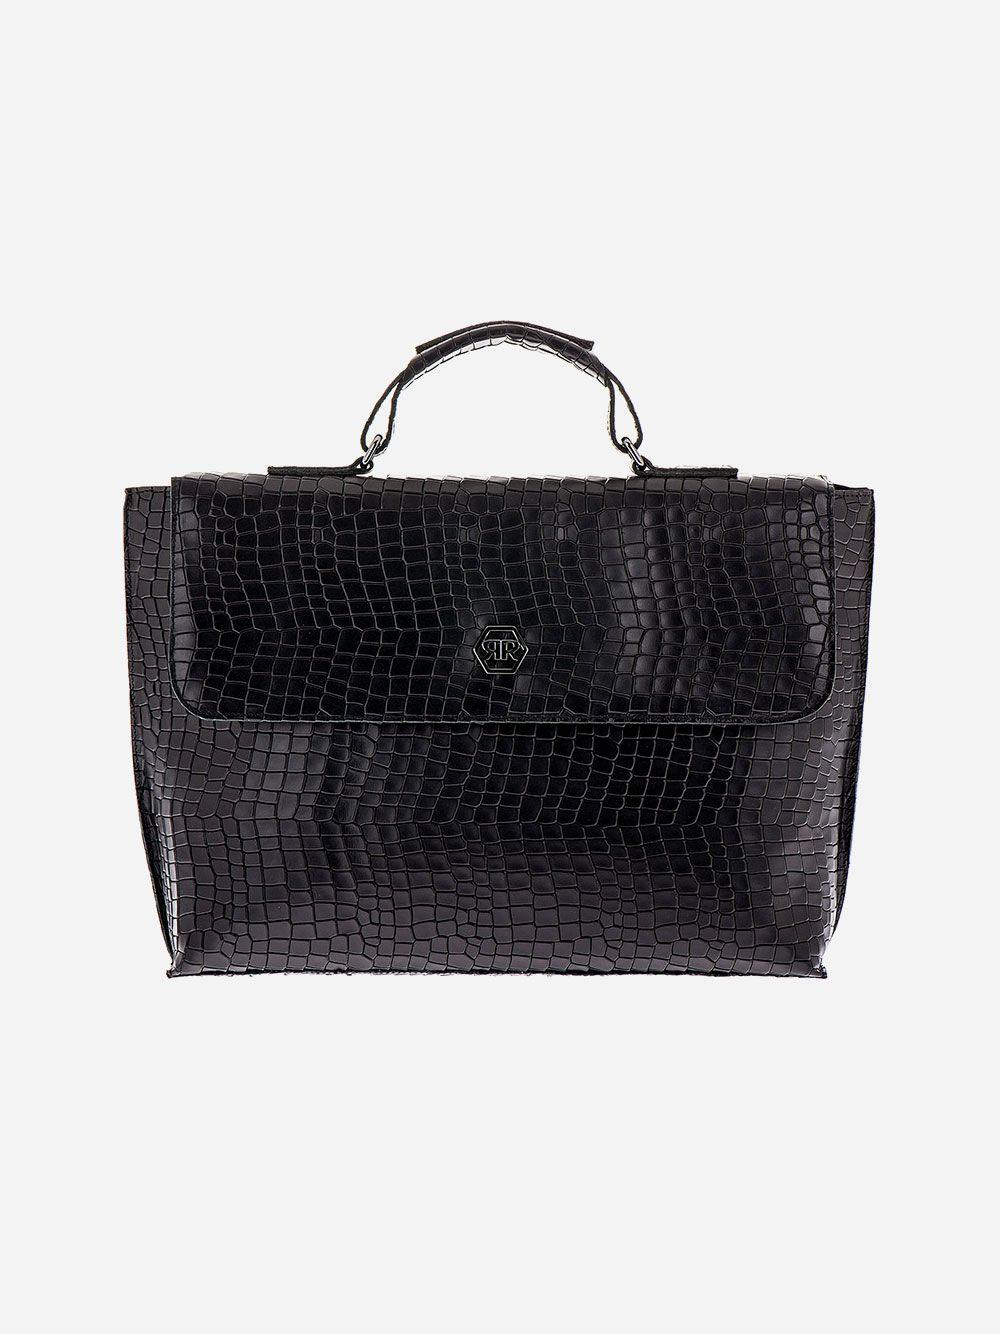 Black Croc Effect Briefcase | Rufel